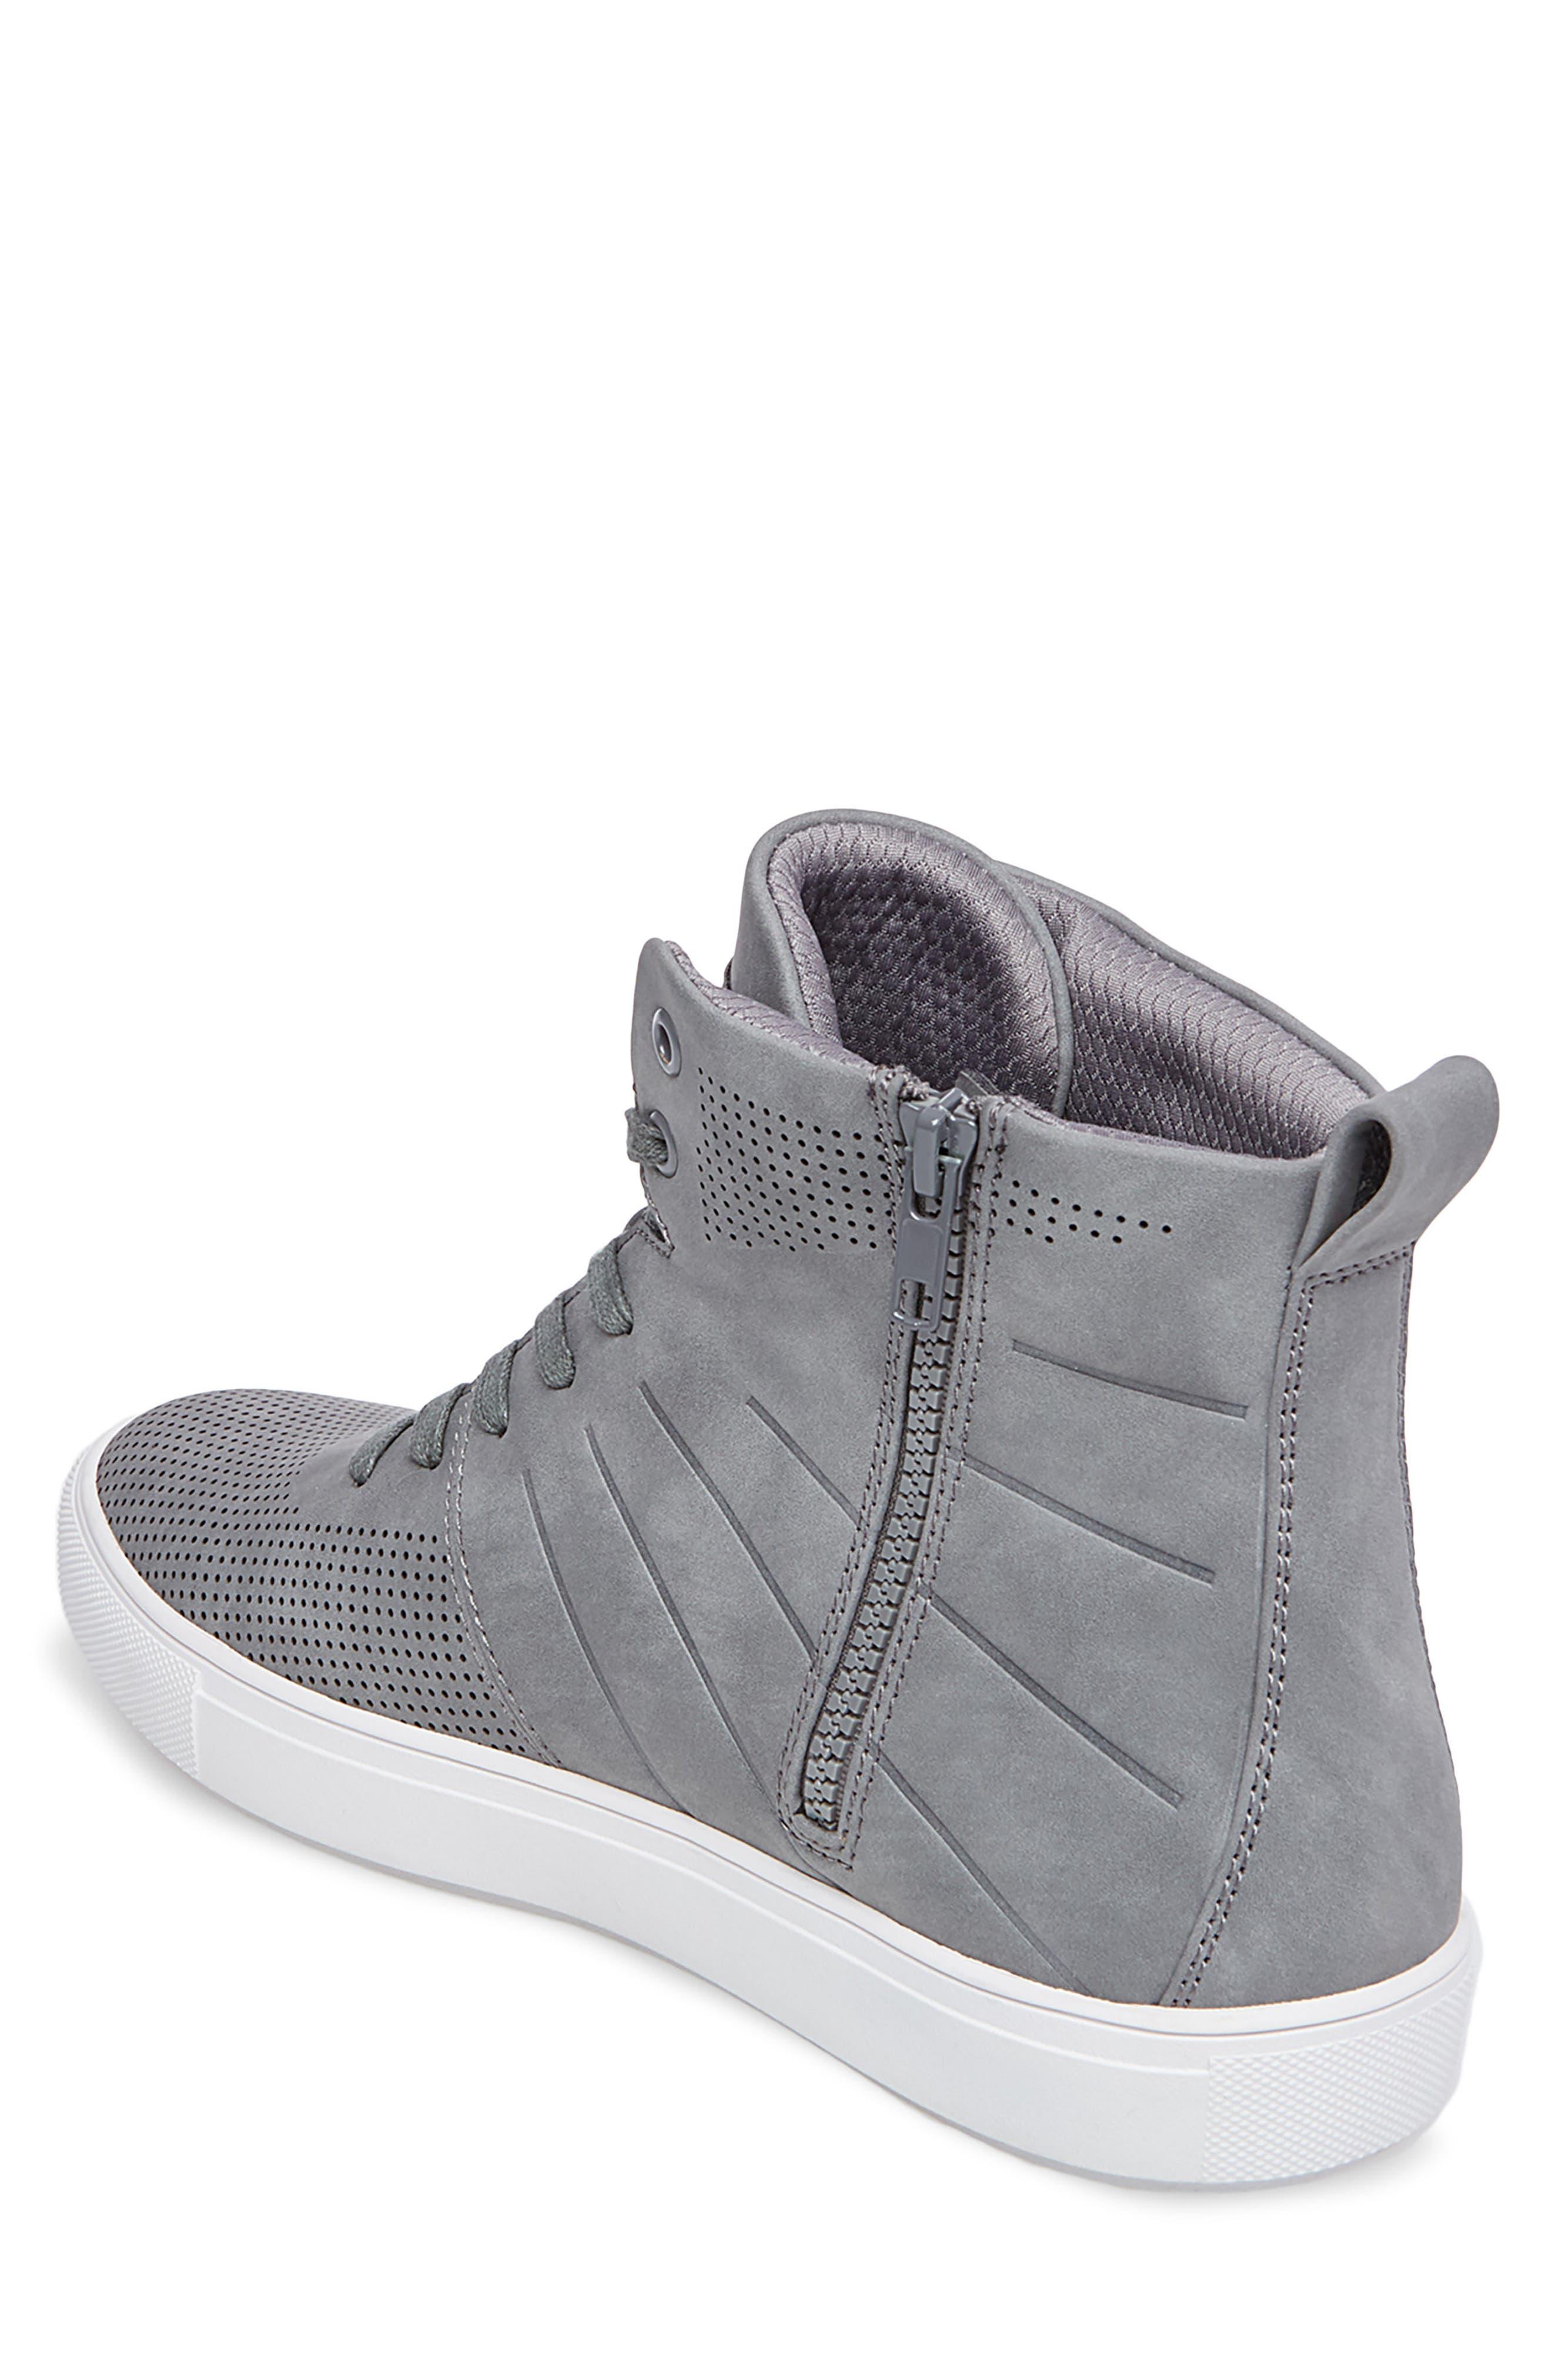 Zeroday Sneaker,                             Alternate thumbnail 10, color,